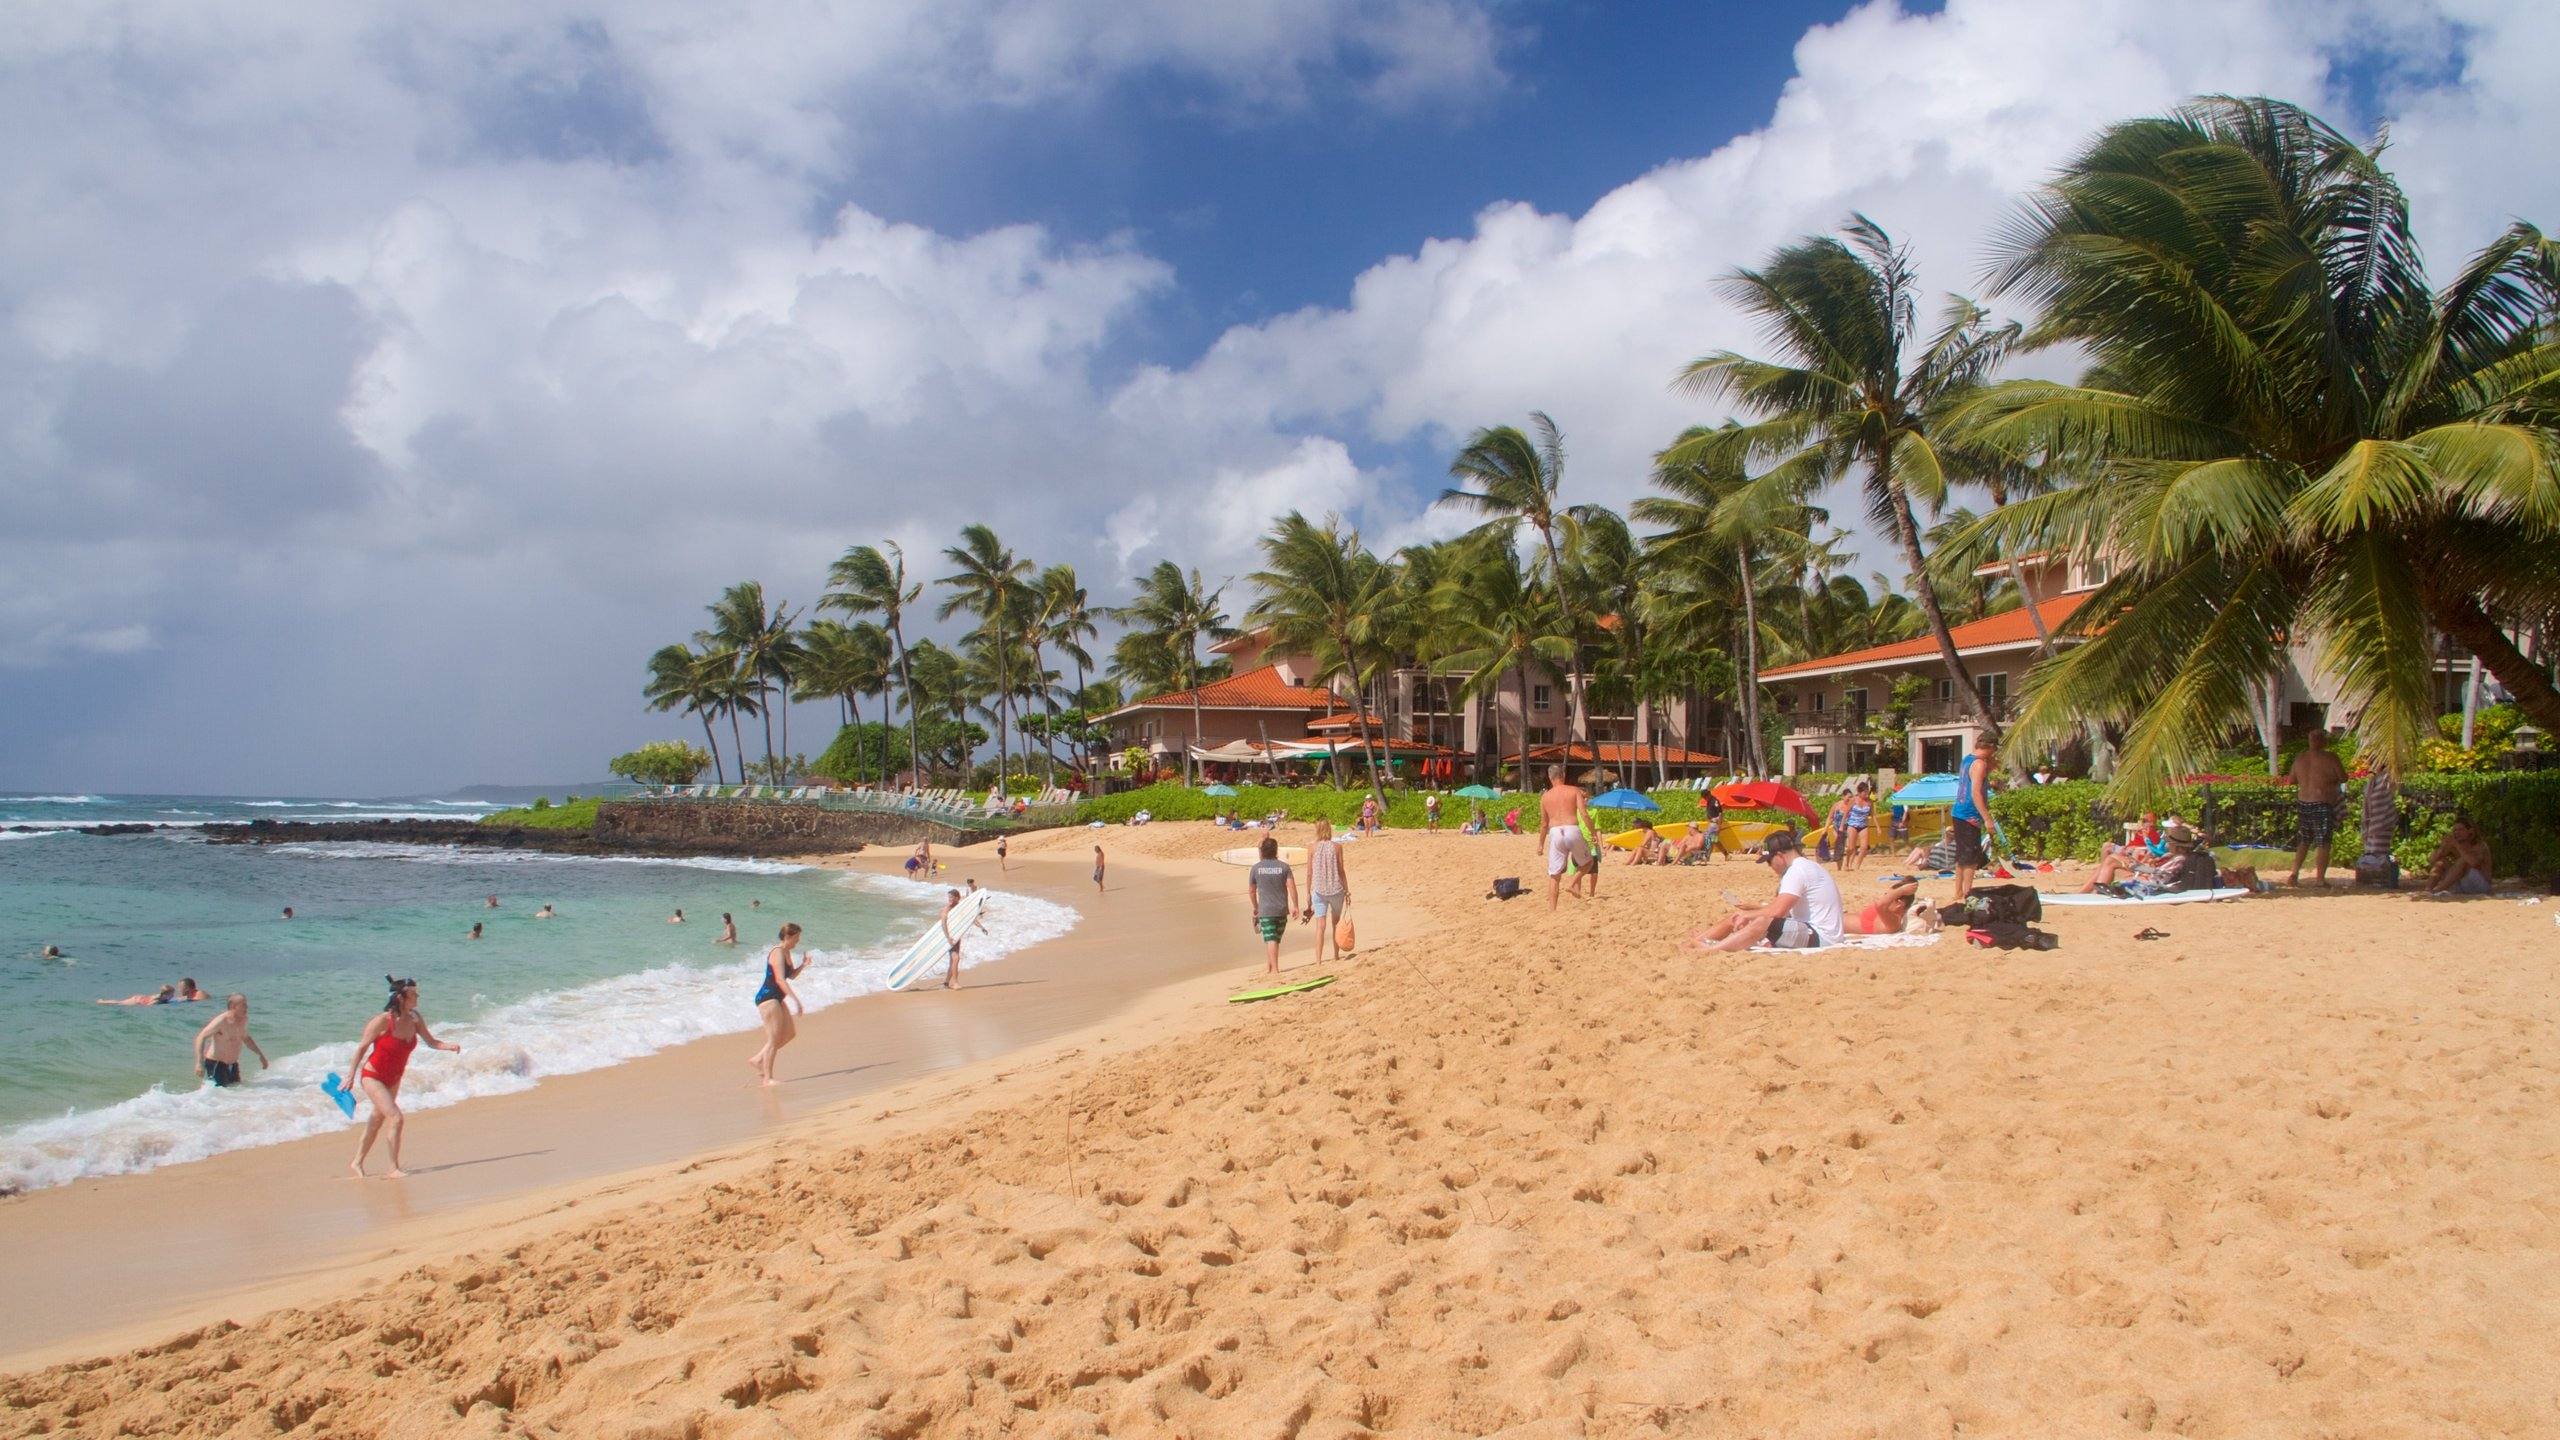 Poipu Beach, Koloa, Hawaii, USA